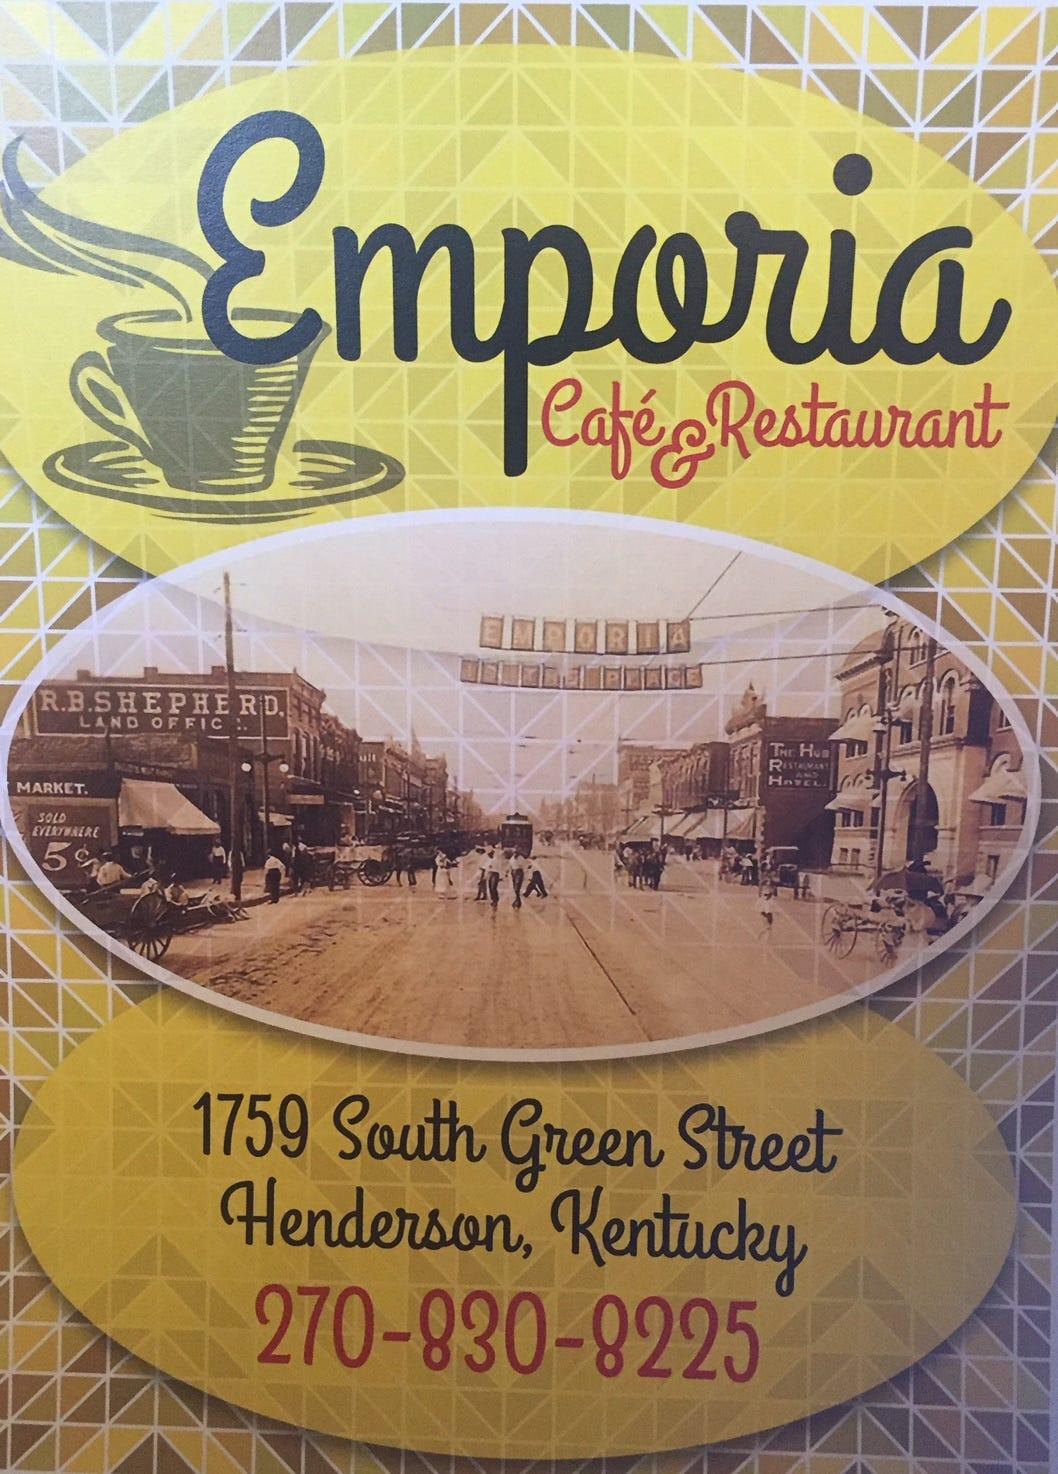 Emporia Cafe Restaurant Set To Open On S Green Street